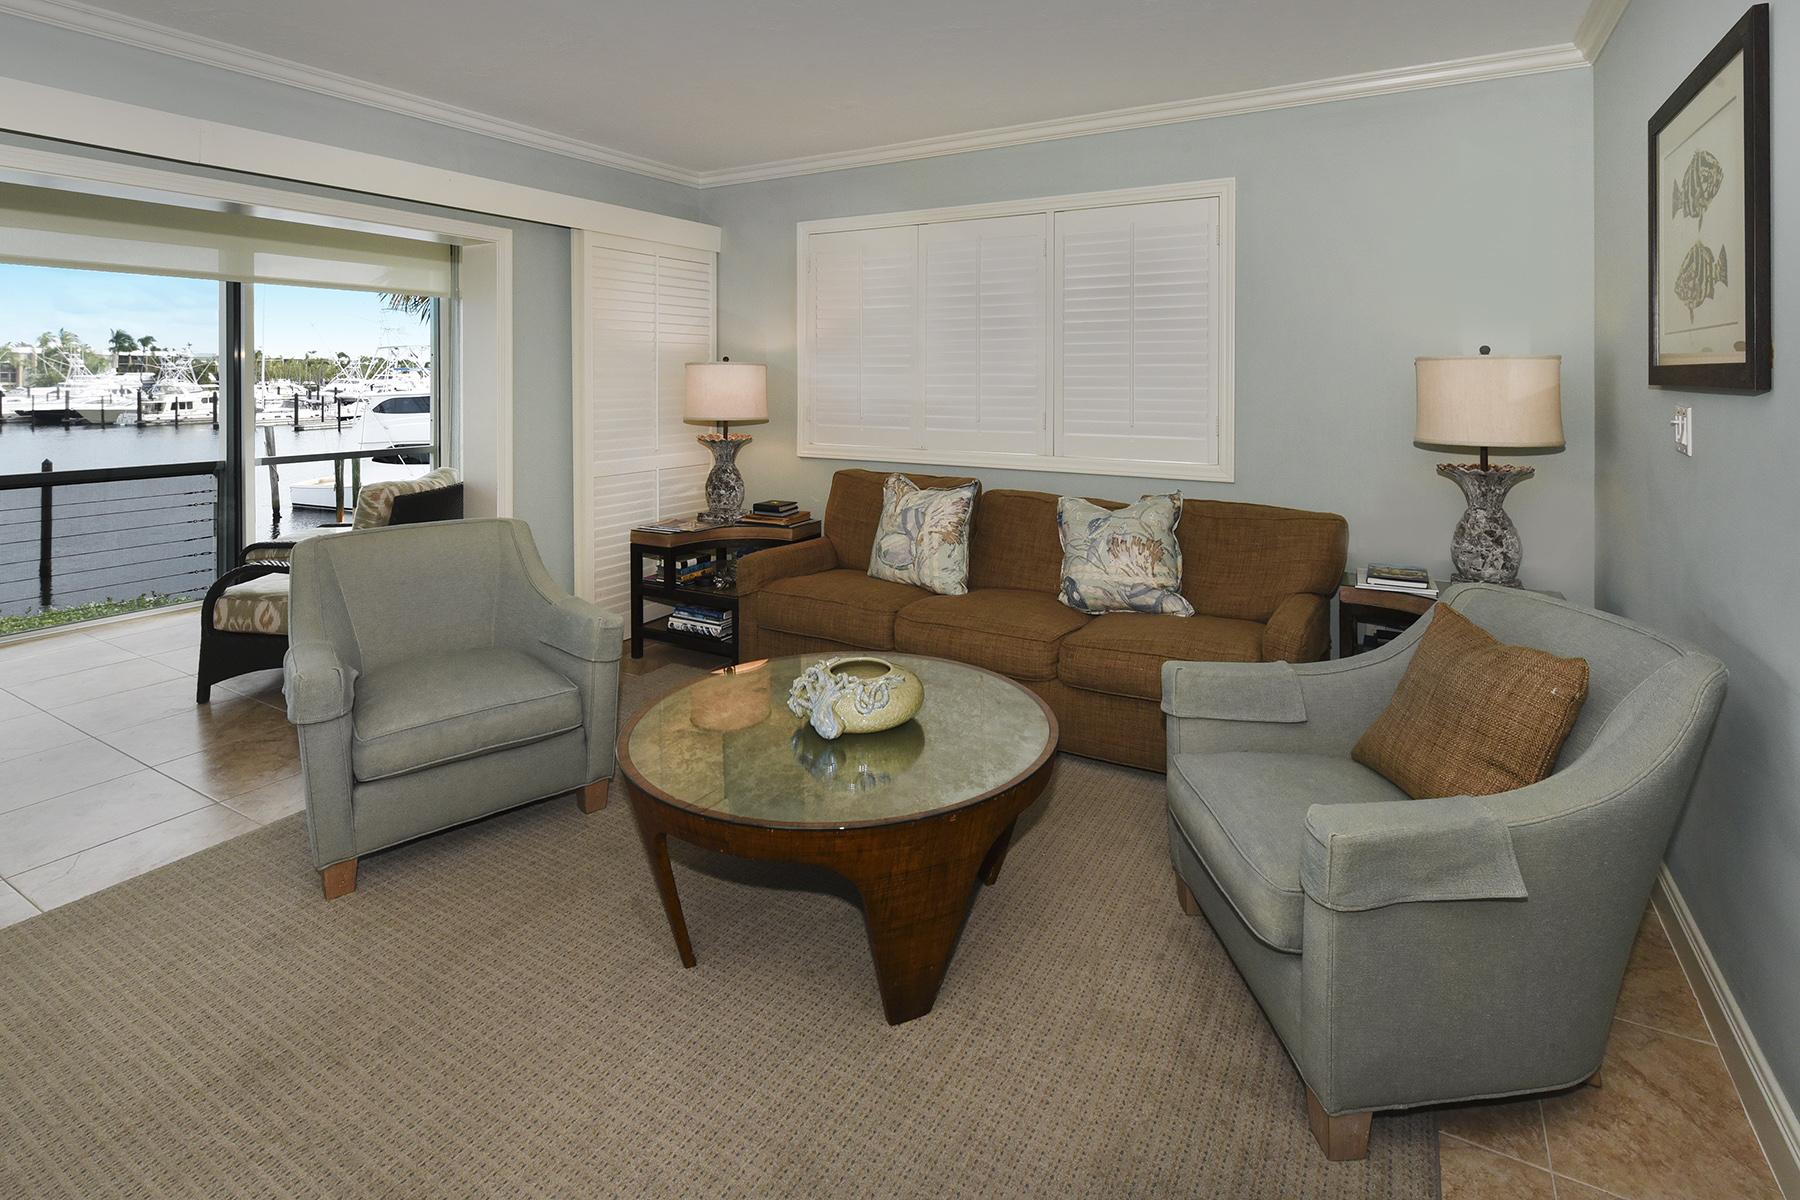 Additional photo for property listing at Waterfront Condominium at Ocean Reef 20 Marina Drive, Unit A Key Largo, Florida 33037 Usa